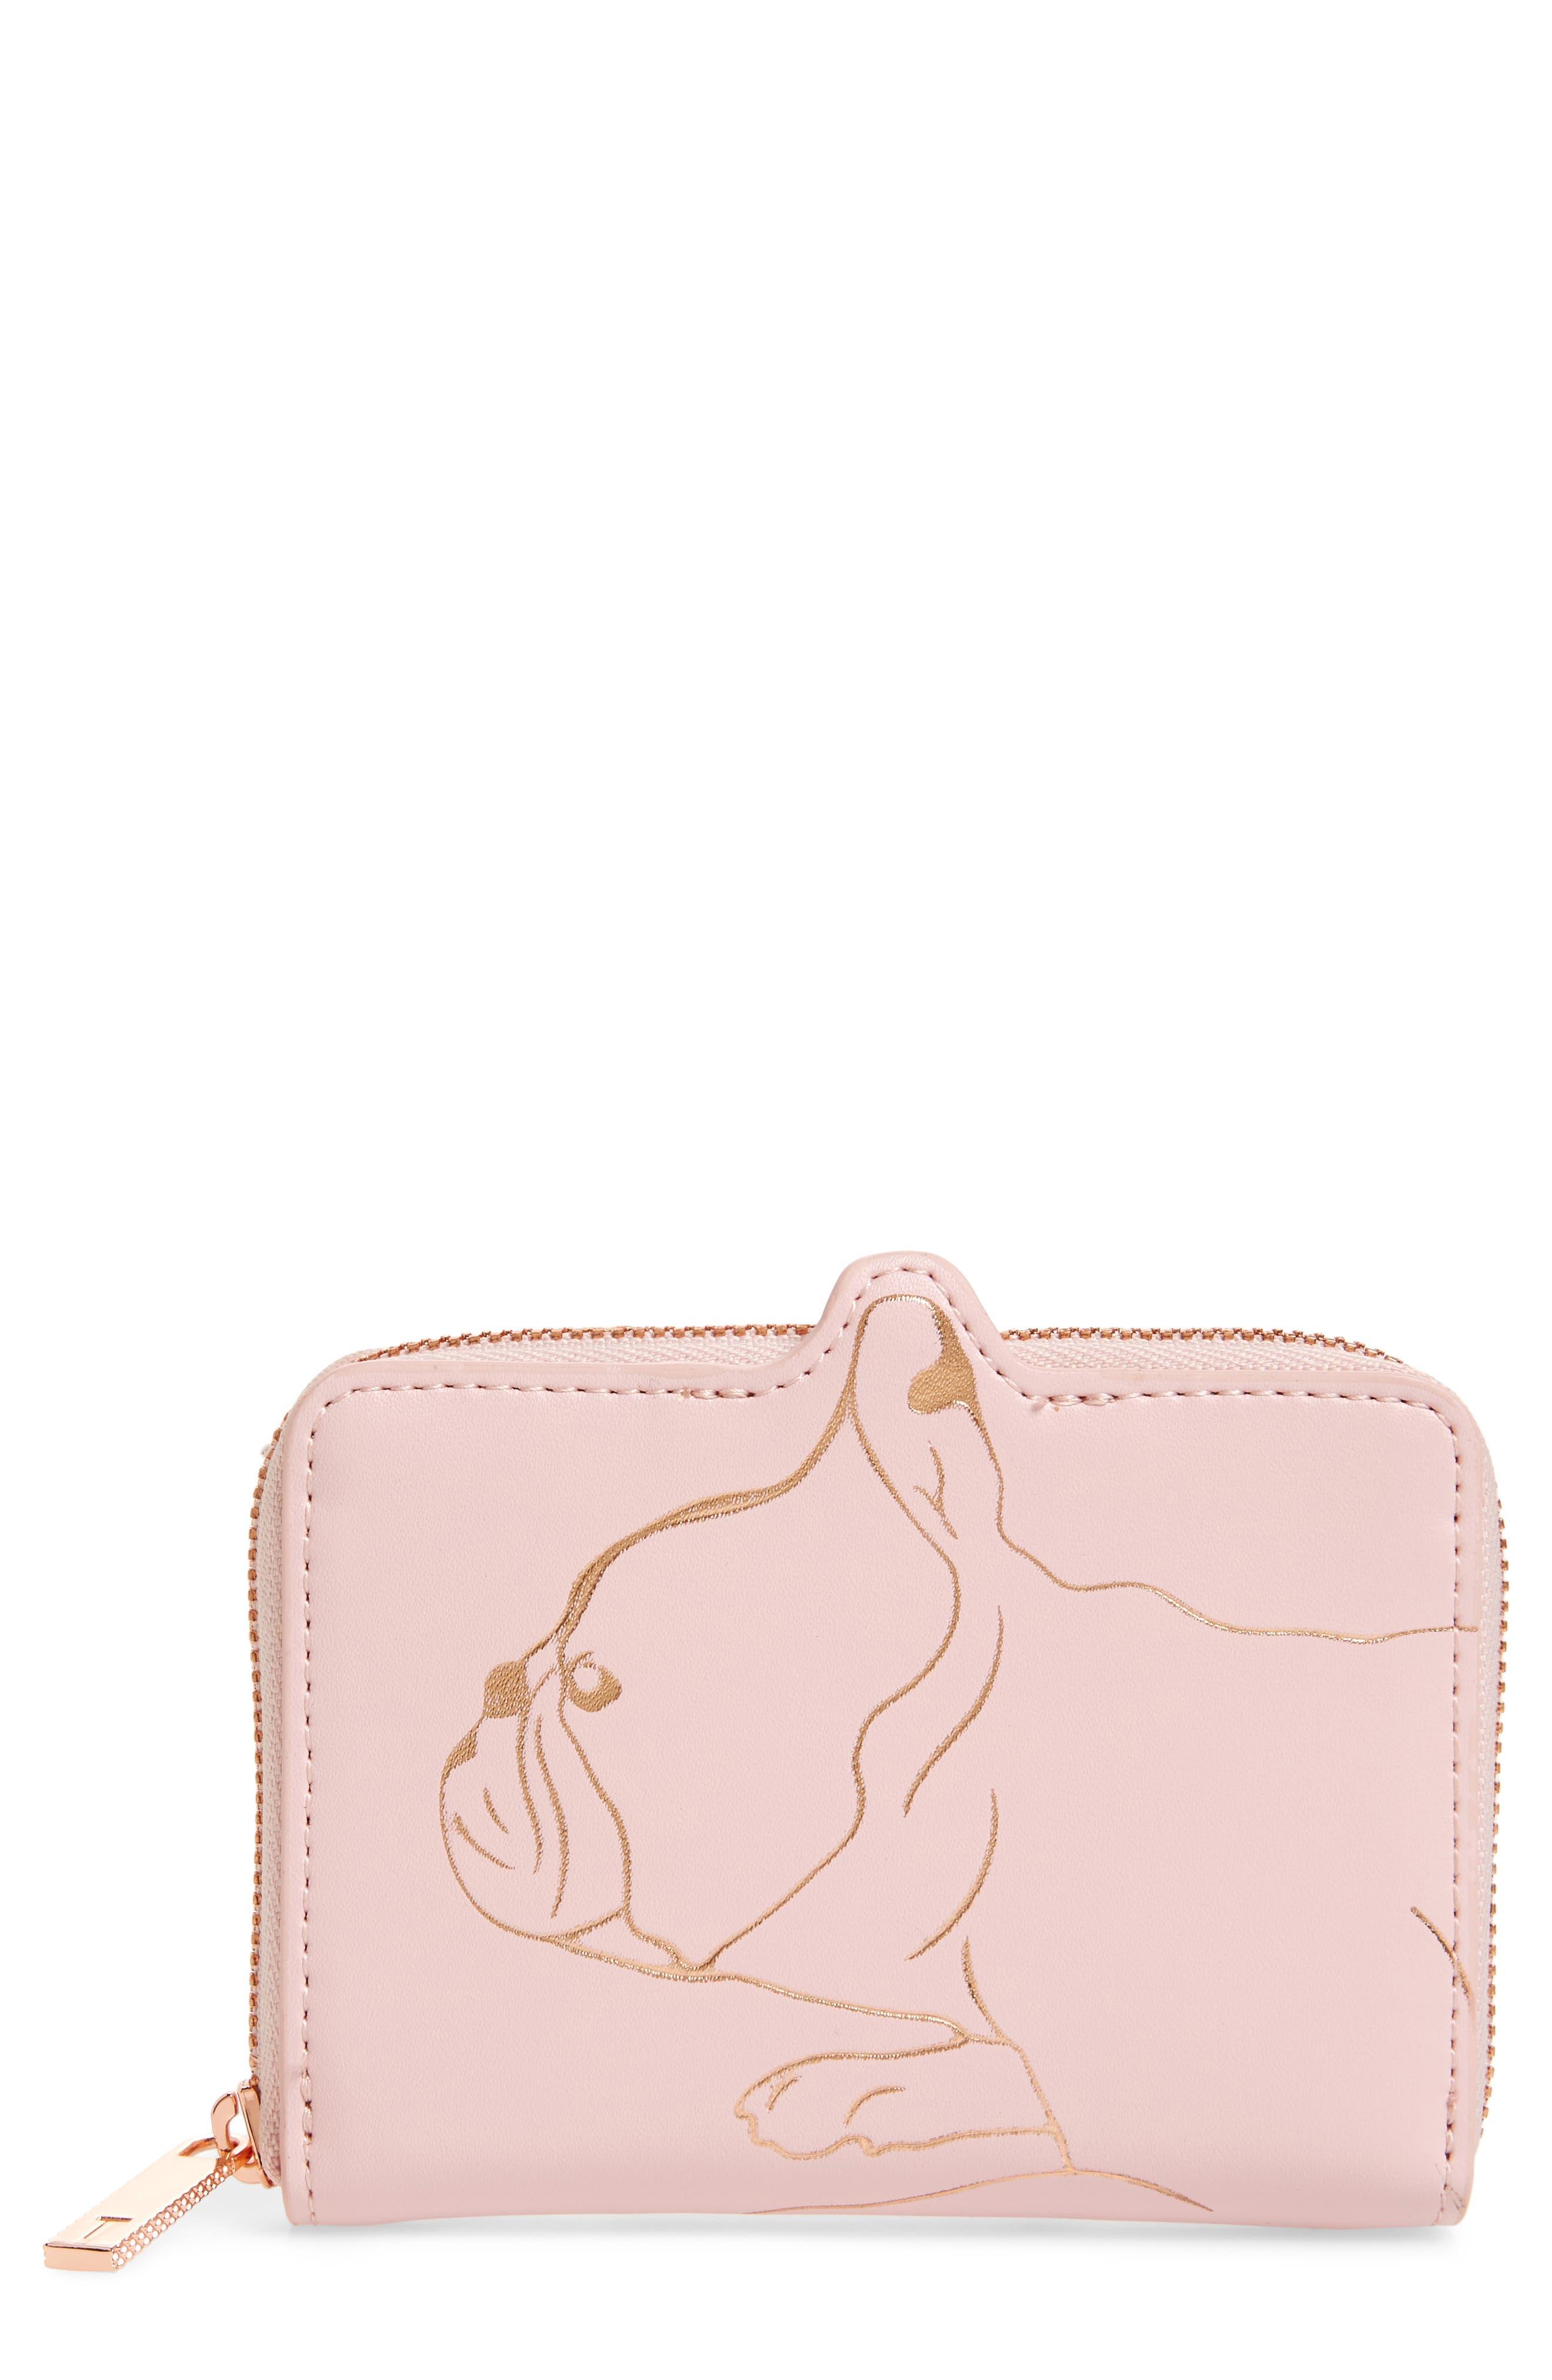 Danyela Leather Zip Purse,                             Main thumbnail 1, color,                             Light Pink